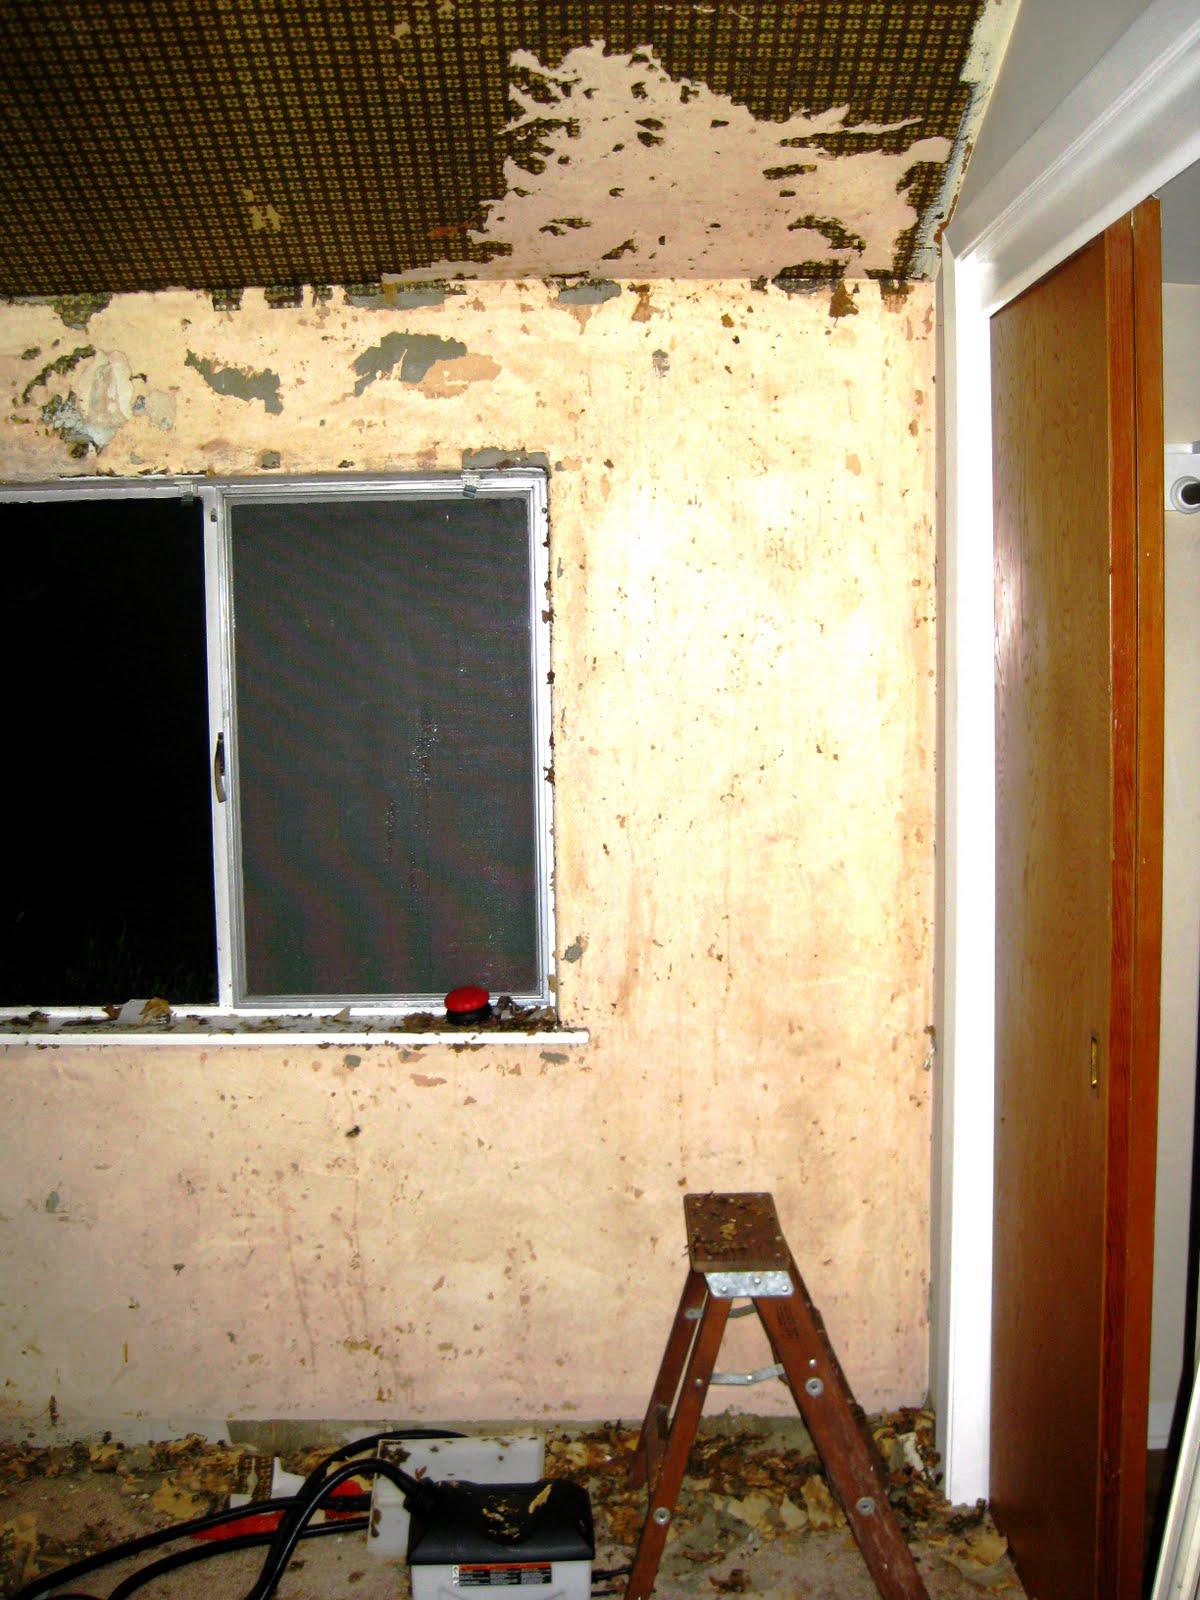 picodur: Wallpaper on Old Plaster Walls: Wallpaper Steamer, Peeling Paint, and ...